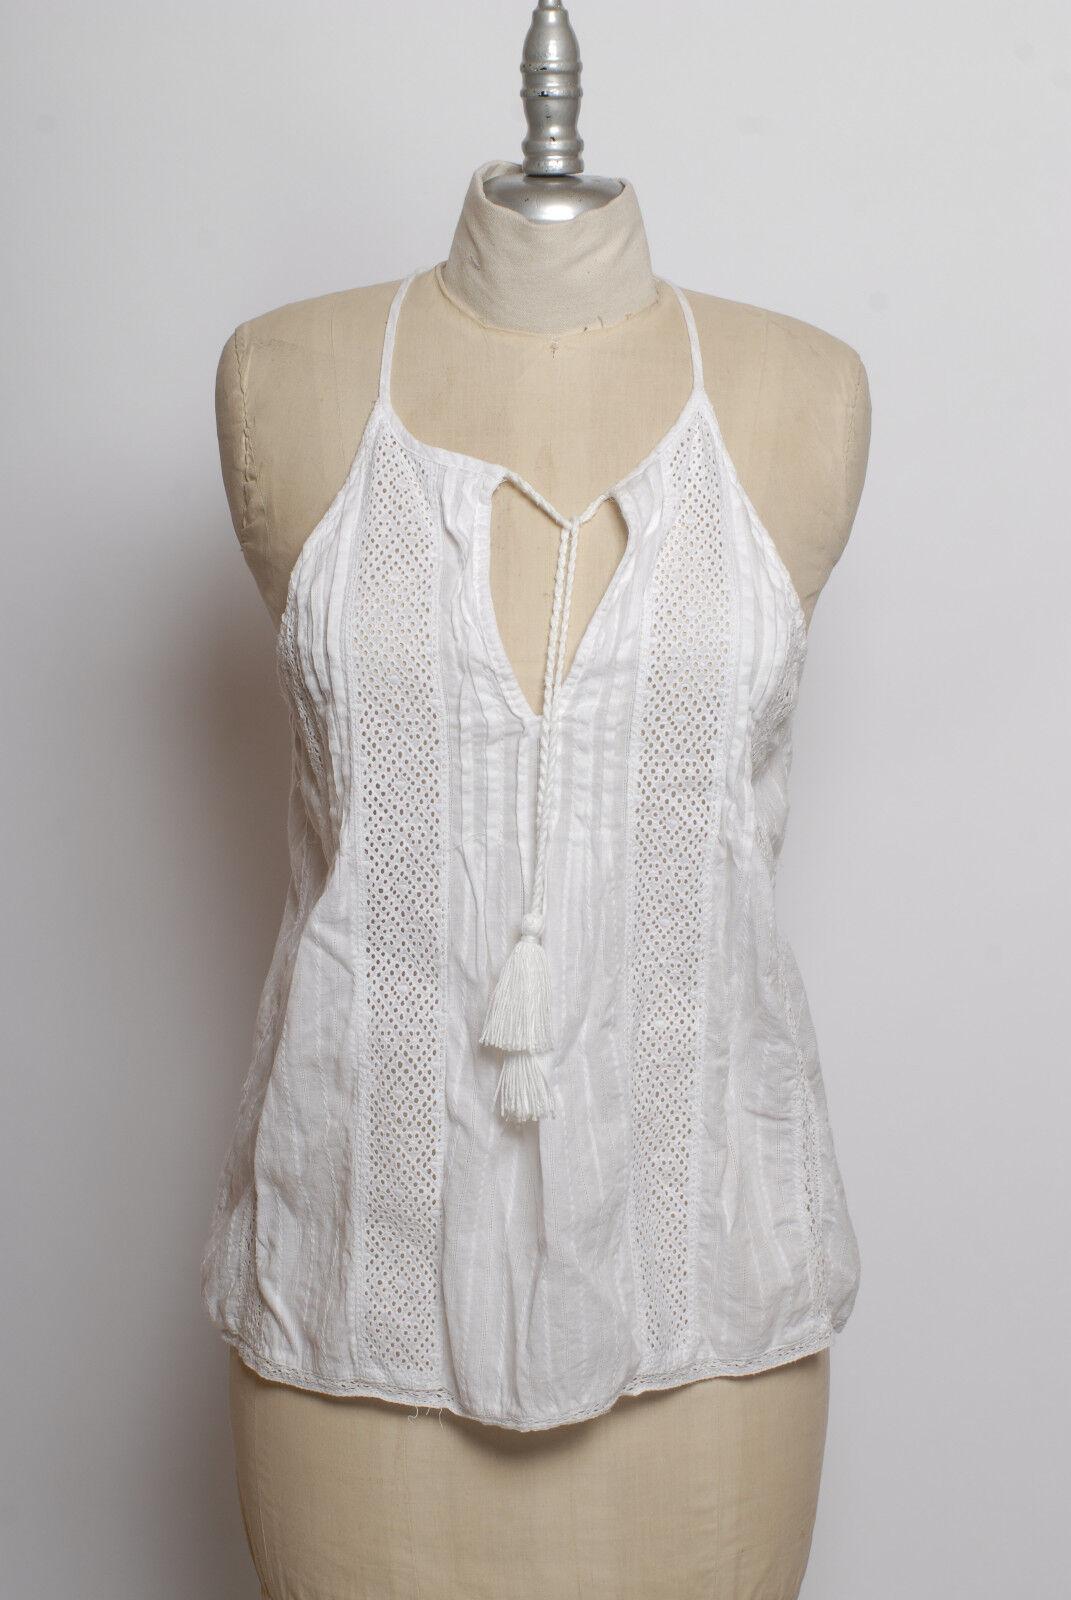 Joie Tita Weiß cotton embroiderot eyelet front pleat & tassel tie halter top XS